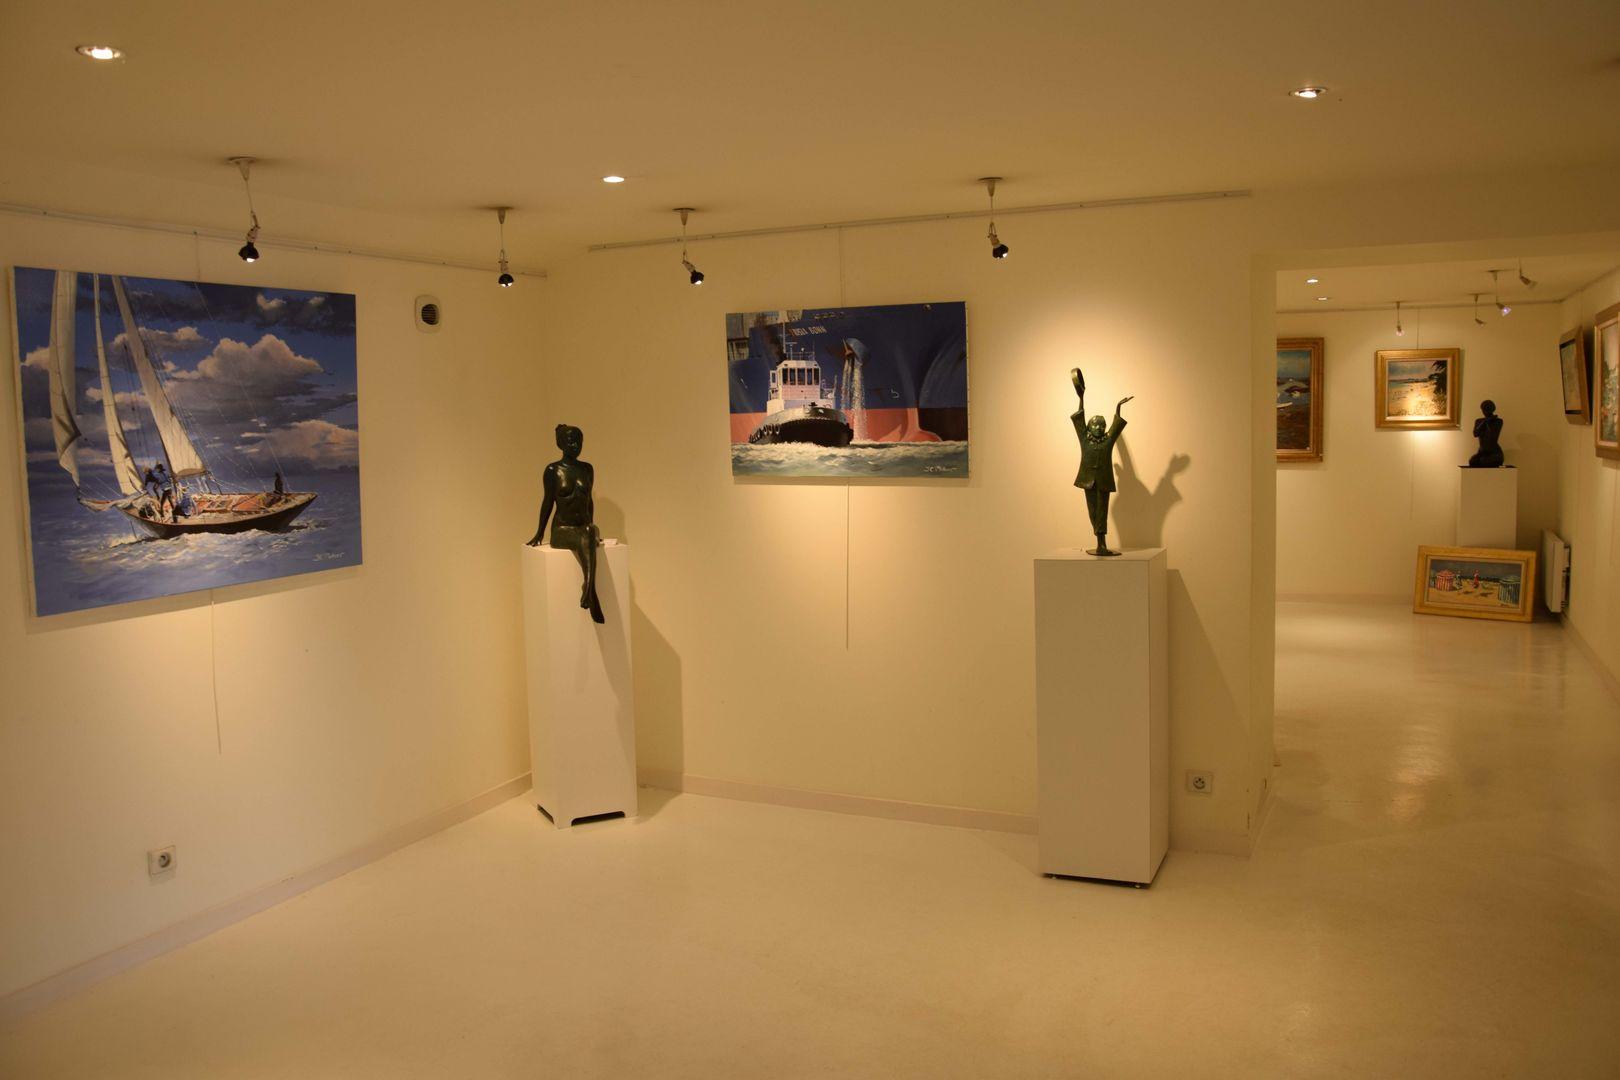 Galerie d'Art Athéna interieur Marie Hellier 8 mo